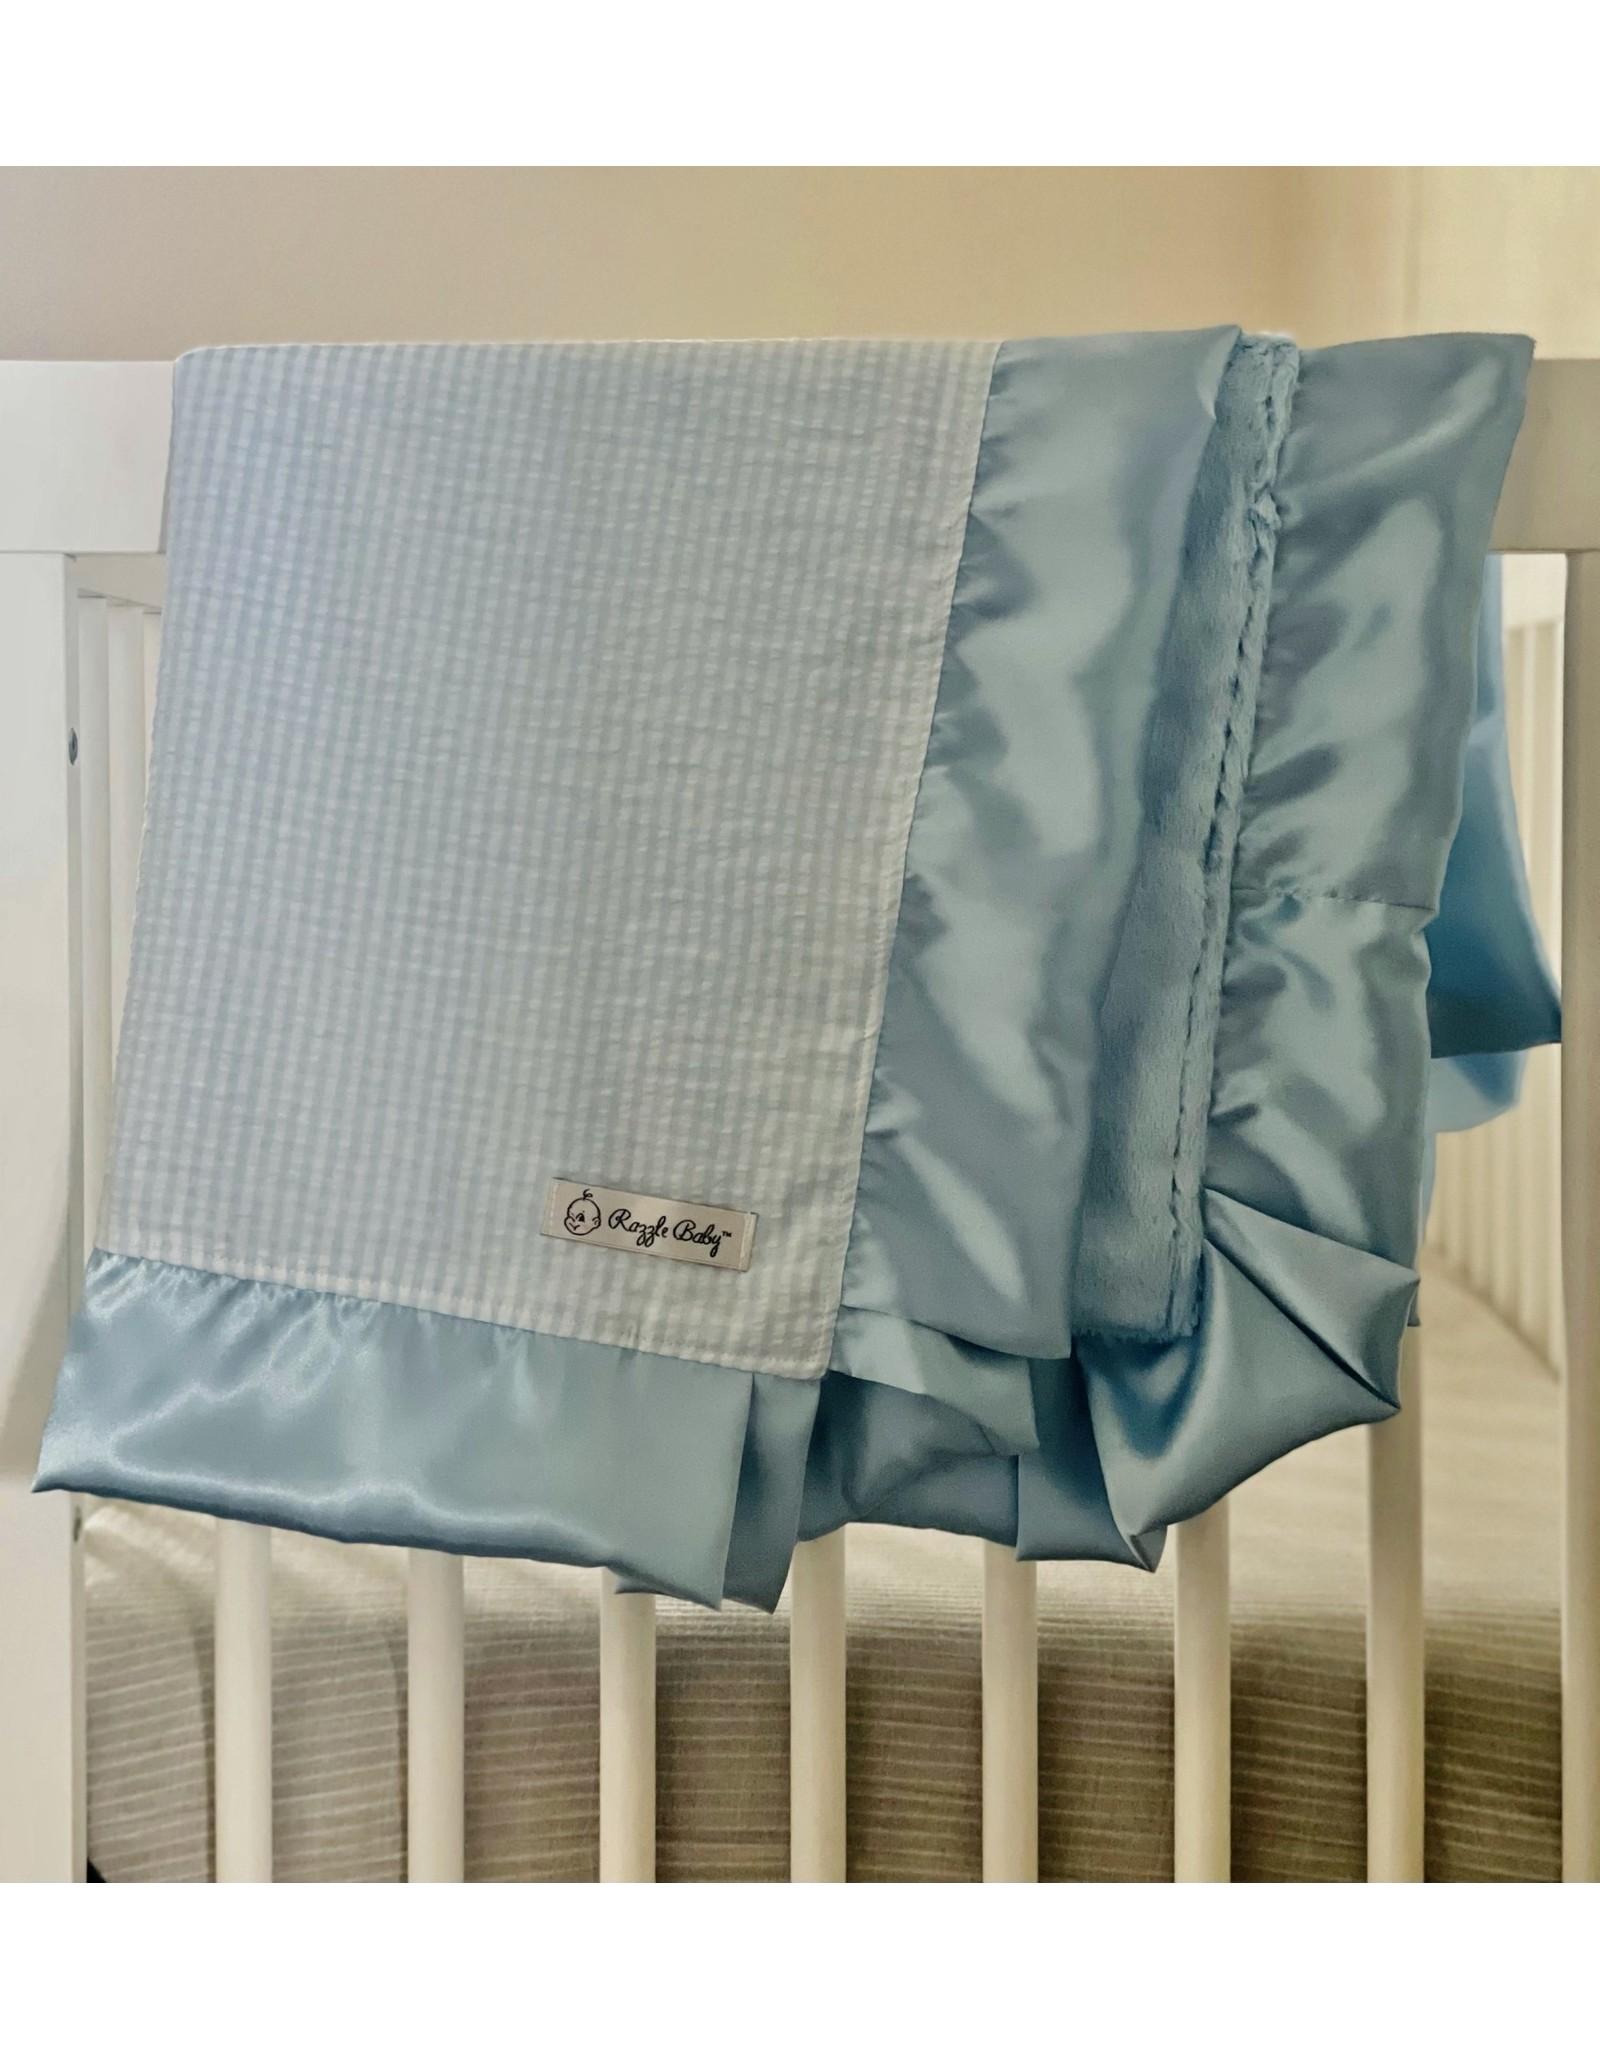 Razzle Baby Razzle Baby- Double Plush Blue Seersucker Blanket